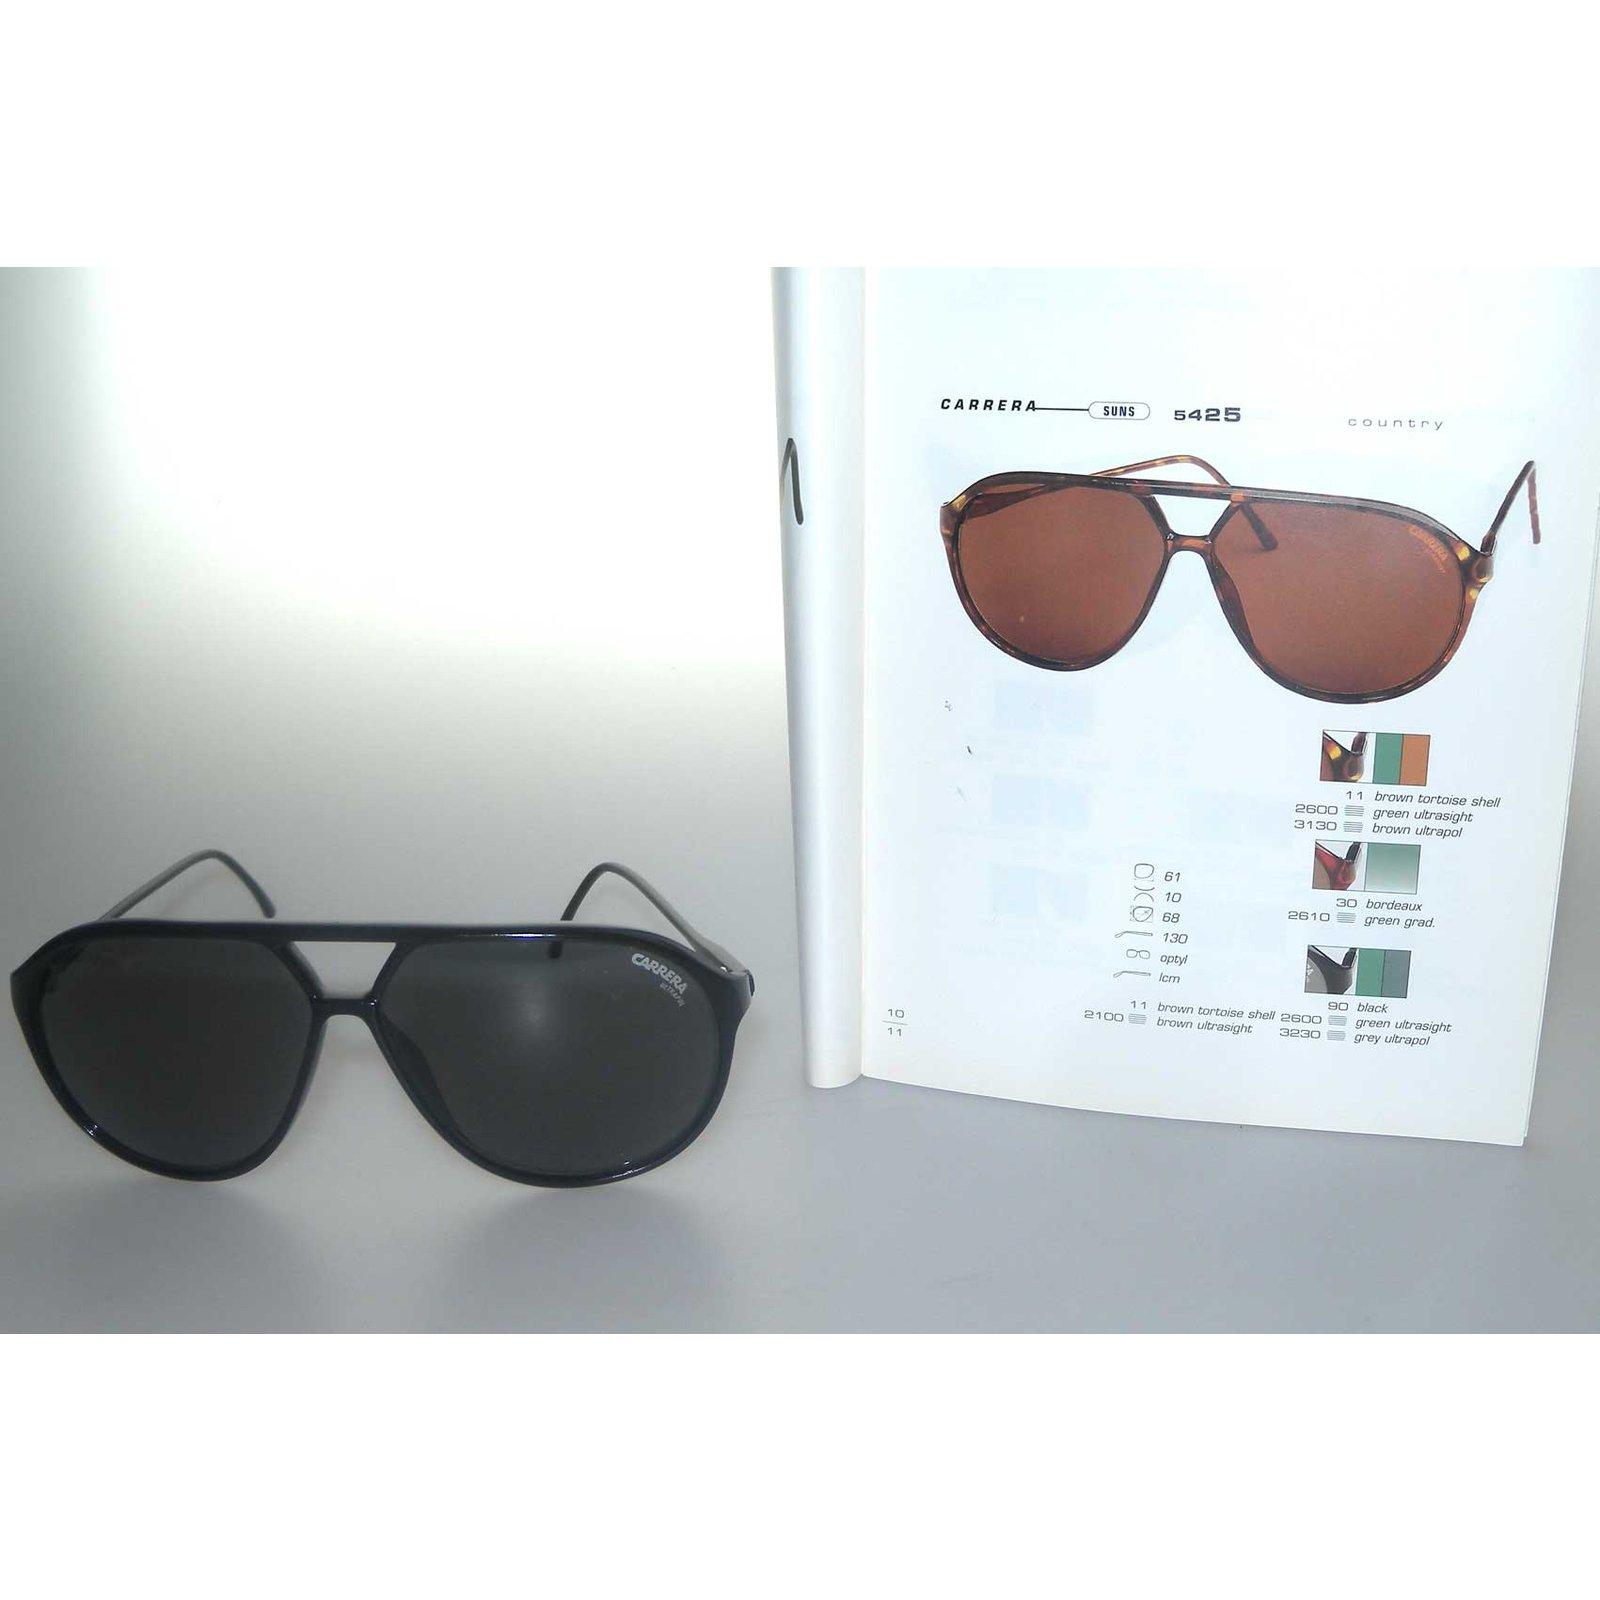 07ef6dfd6fc5a Carrera Aviateur Country collection 95 96 Sunglasses Metal Black ref.70200  - Joli Closet